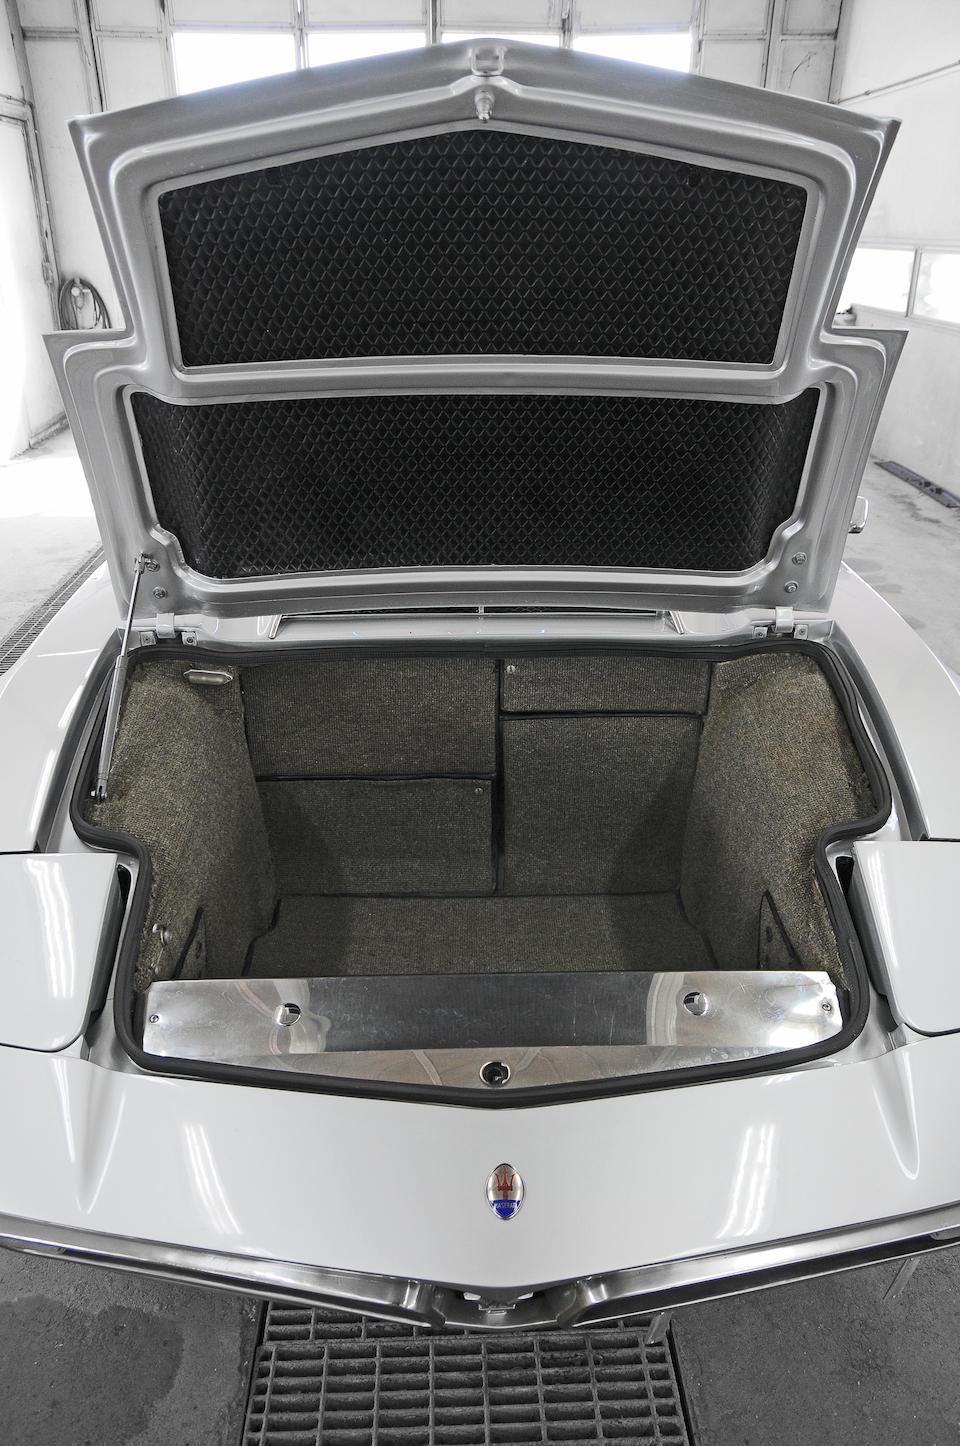 1973 Maserati Bora 4.9-litre Coupé  Chassis no. AM117 49 574